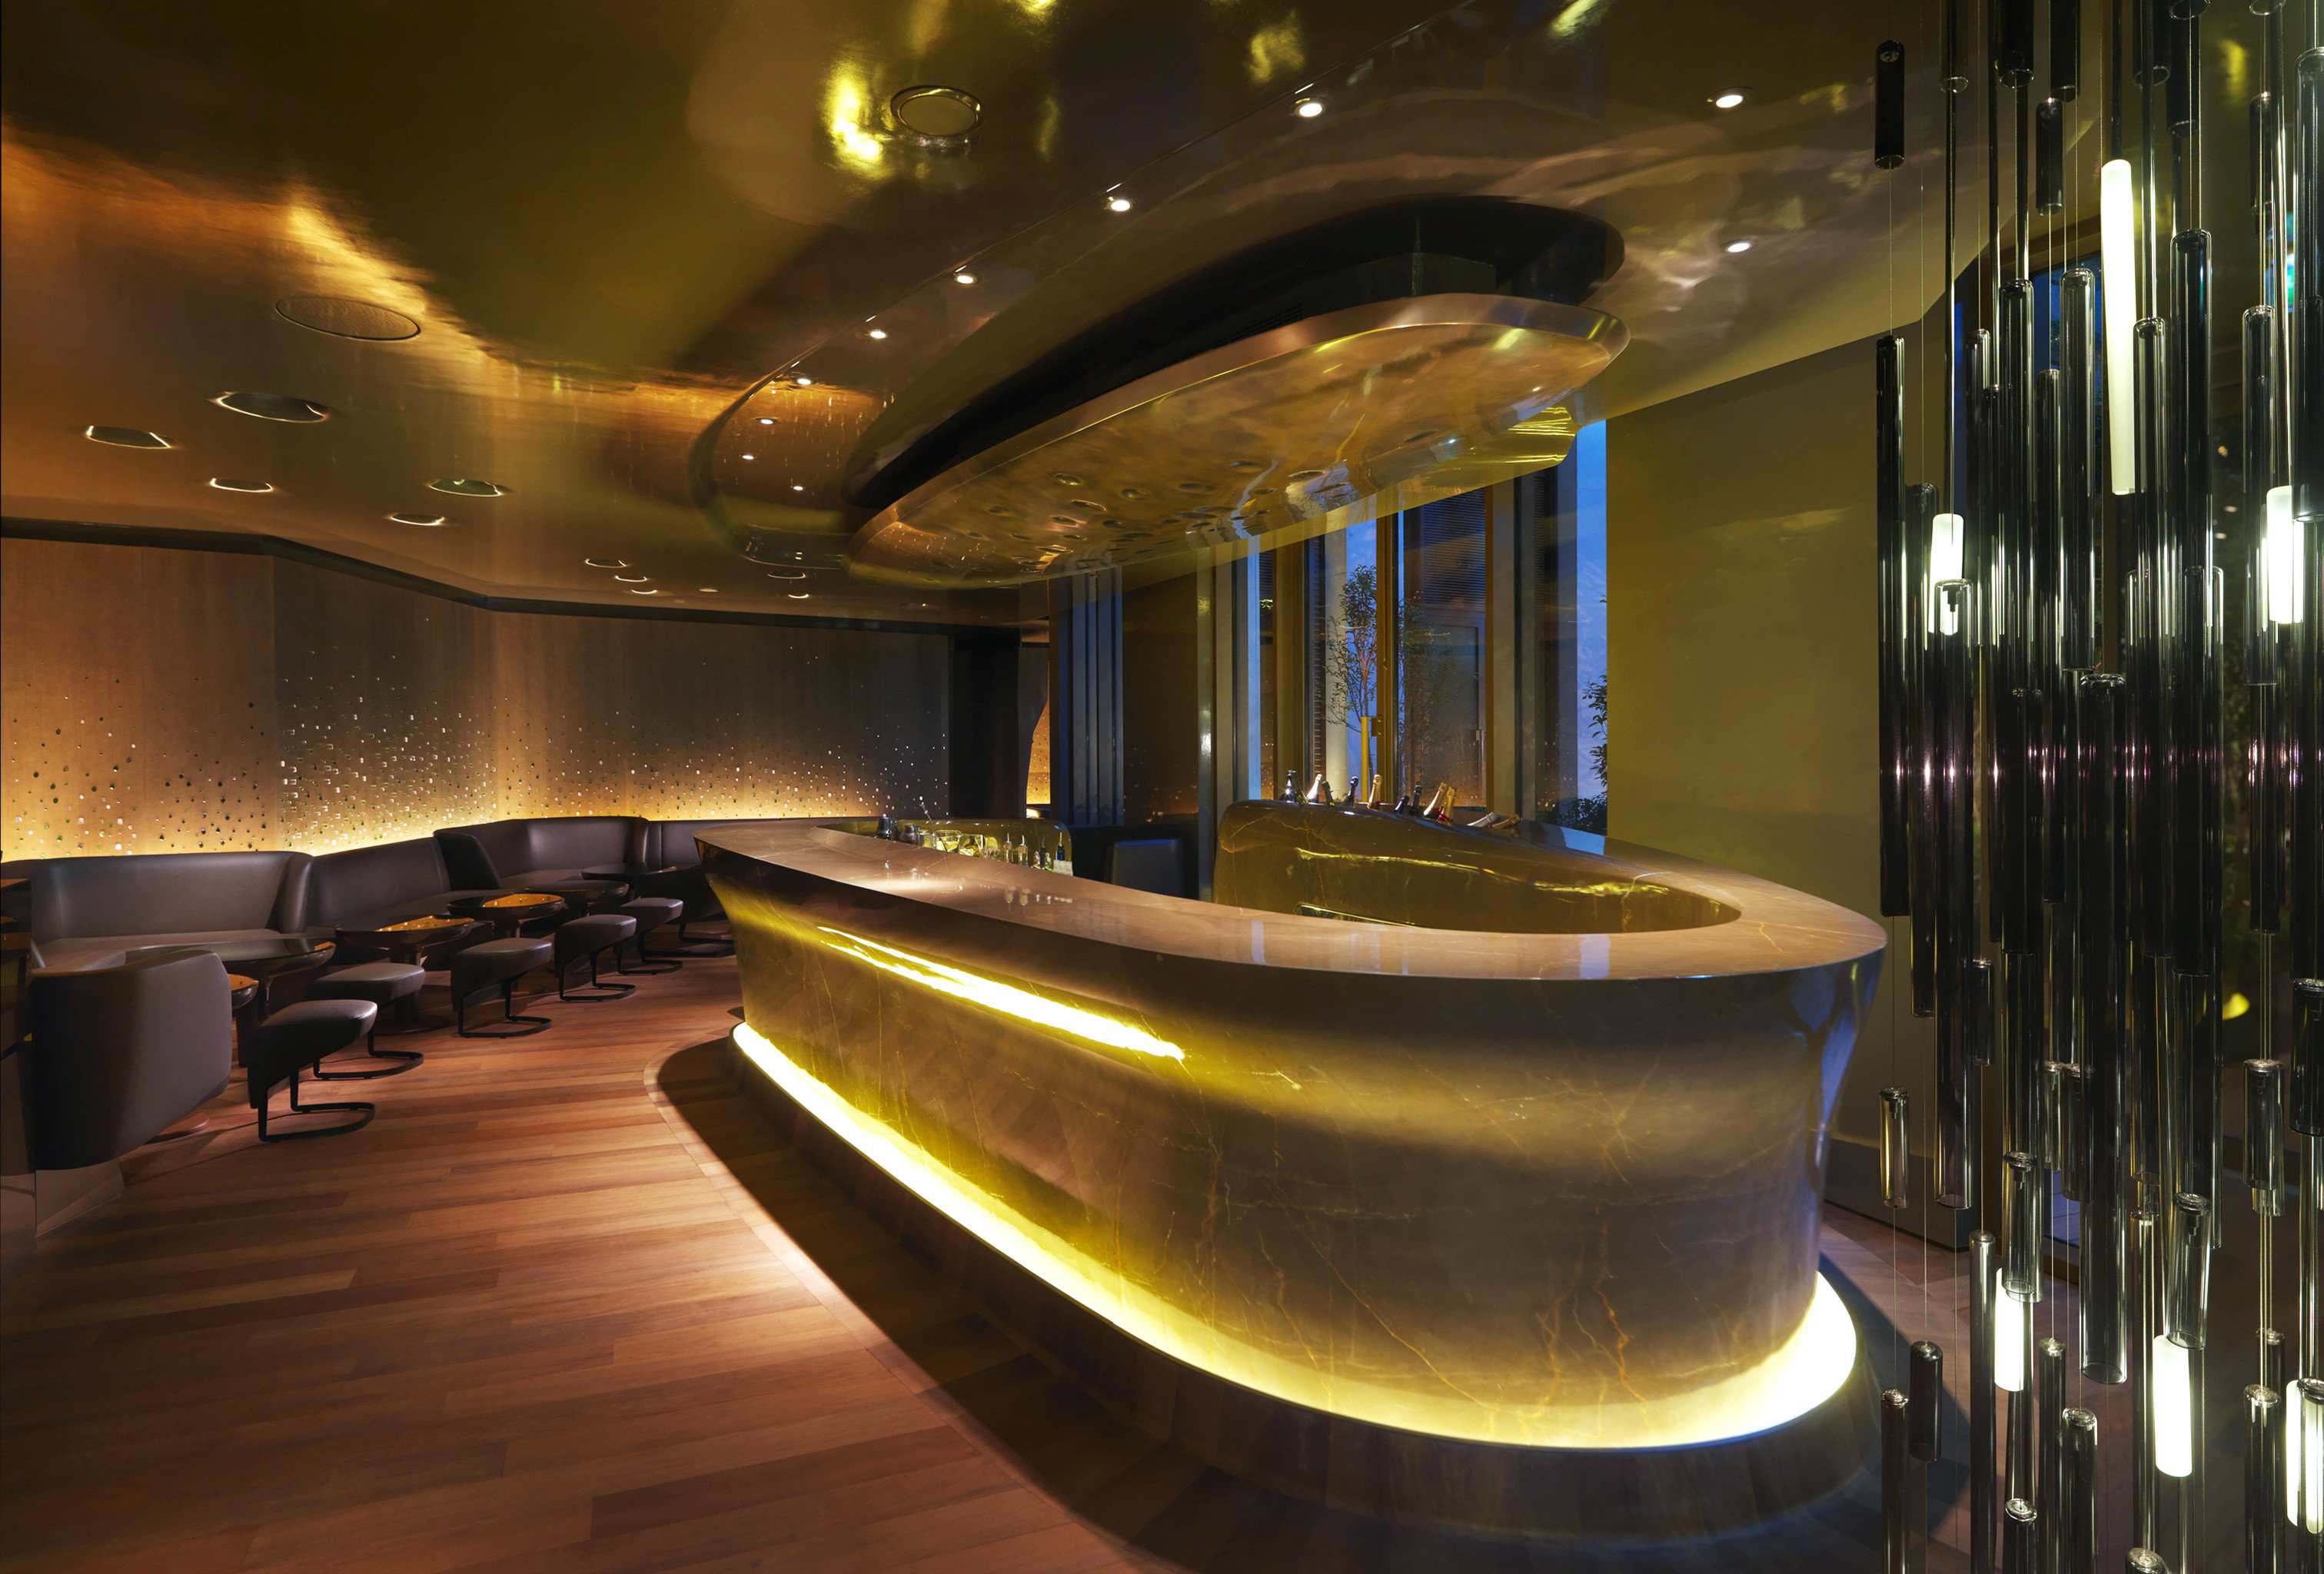 Bar City Drink Eat Hip Luxury Modern Nightlife Lobby lighting restaurant auditorium